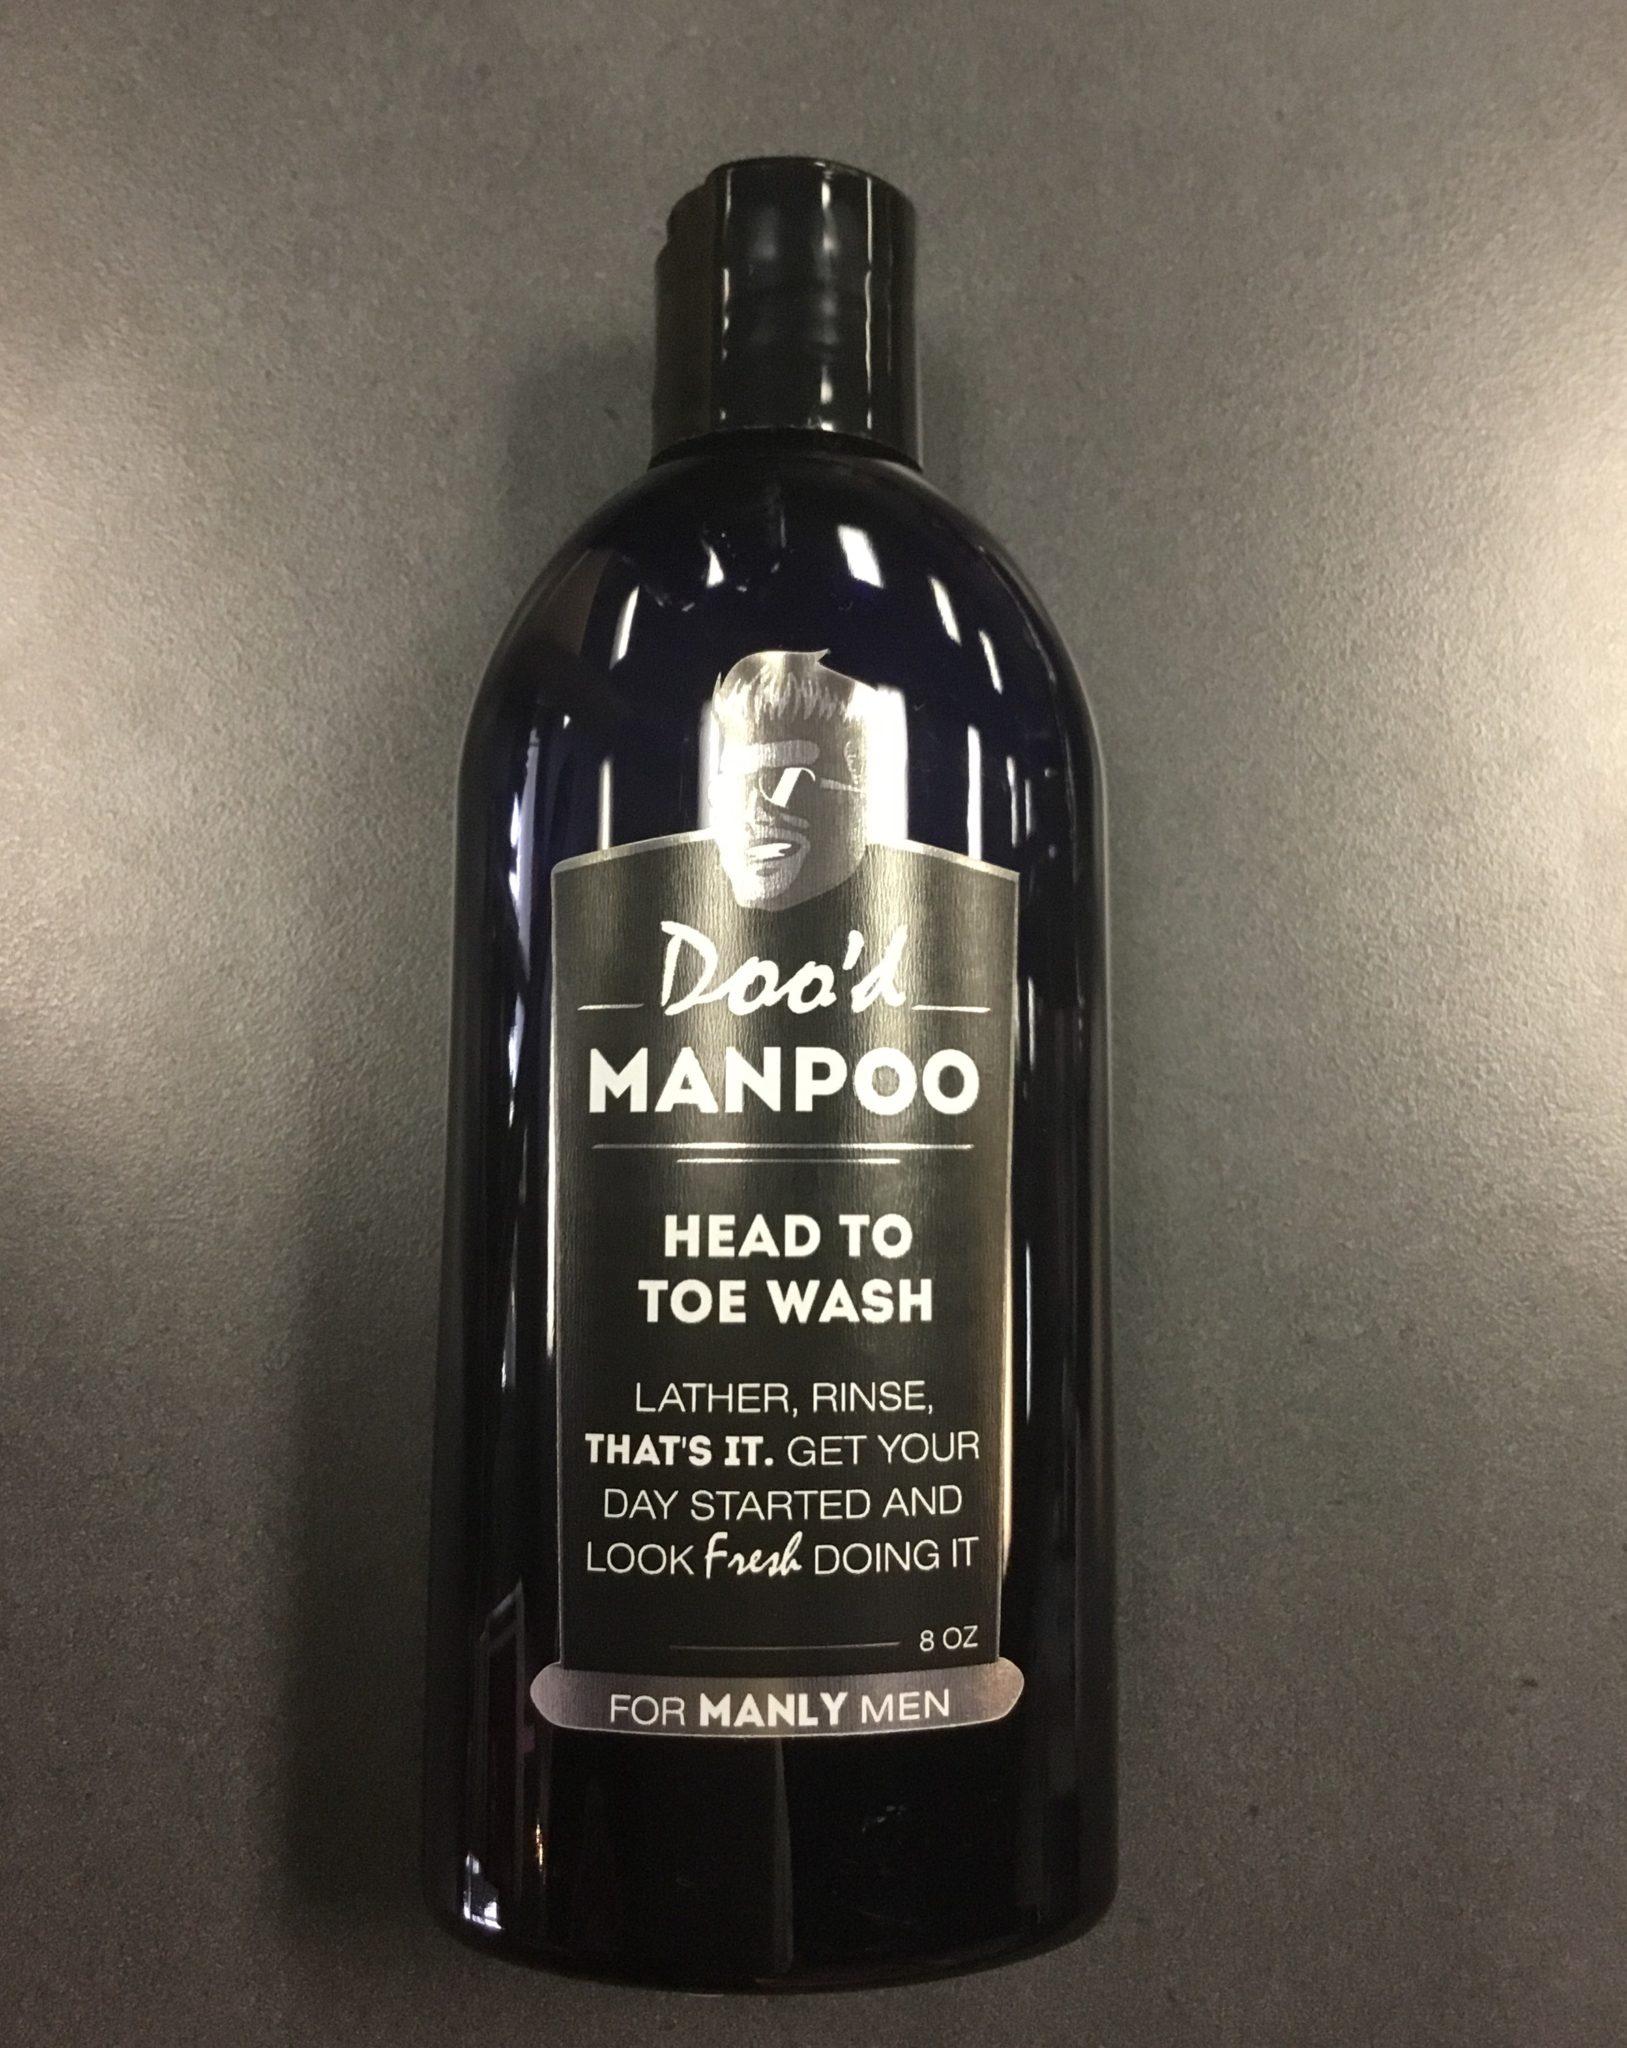 Manpoo